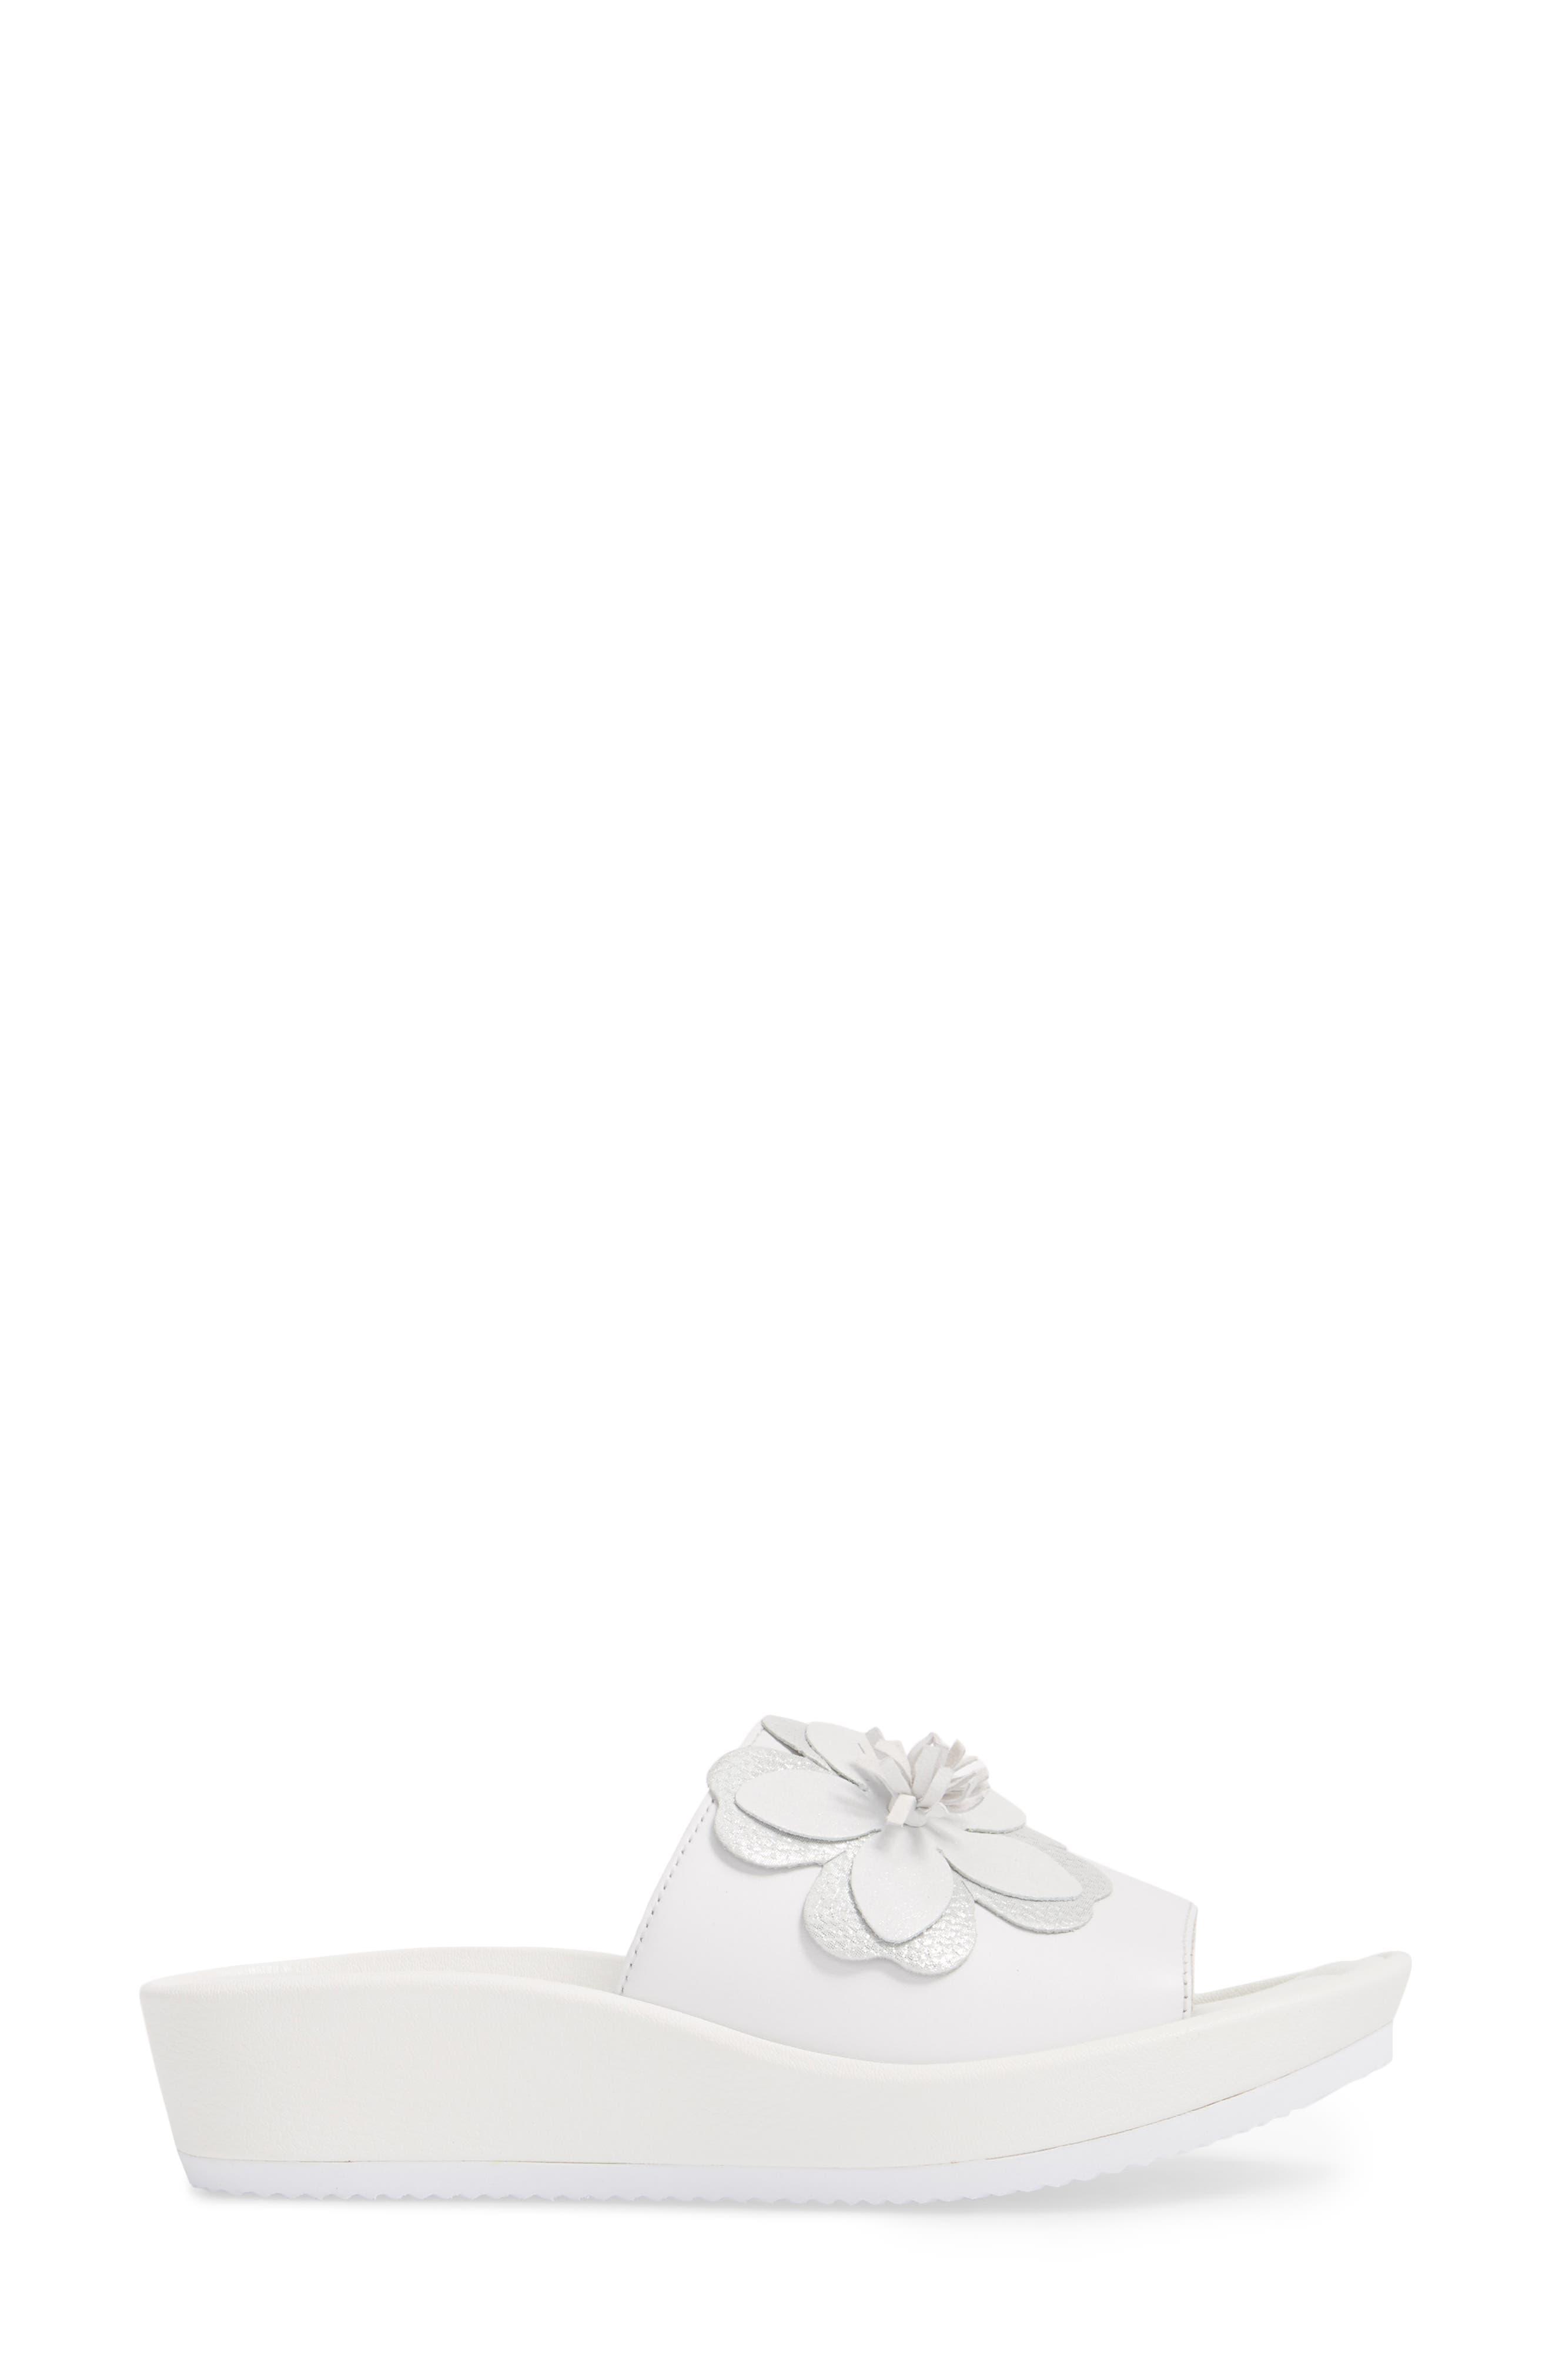 Thea Wedge Slide Sandal,                             Alternate thumbnail 3, color,                             WHITE LEATHER